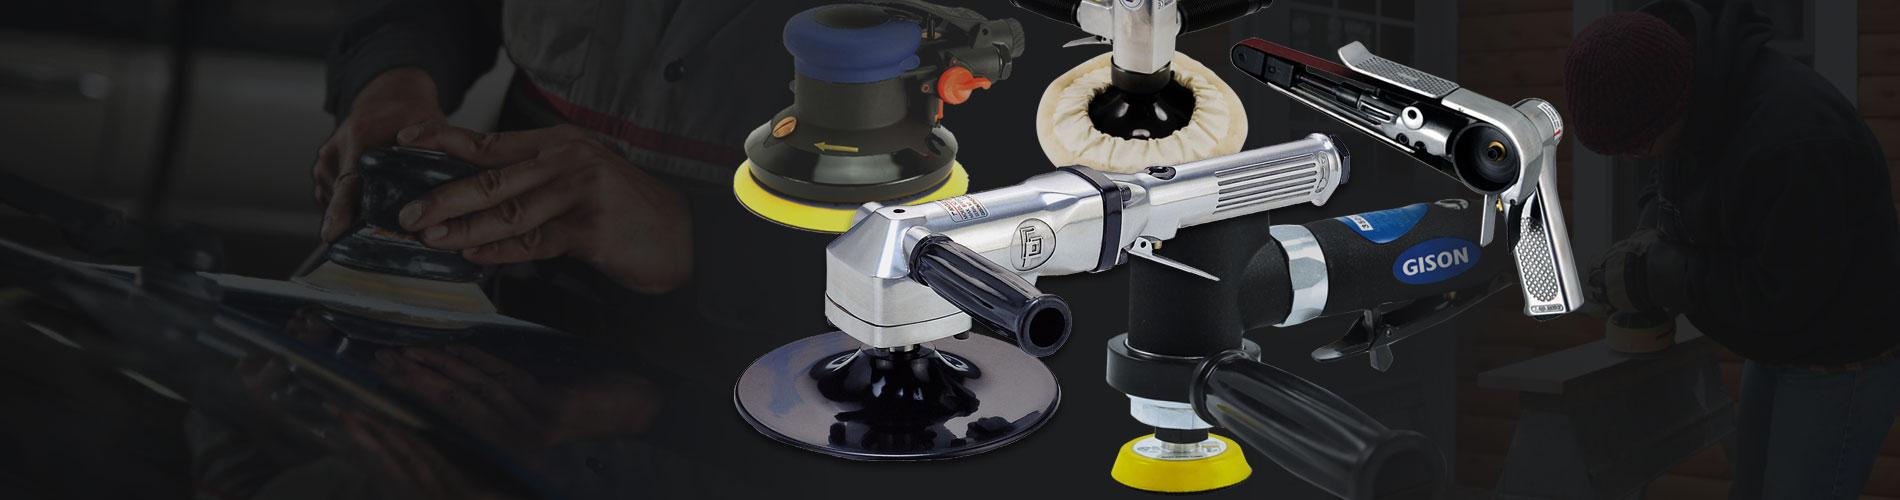 Air Tools for Sanding / Polishing